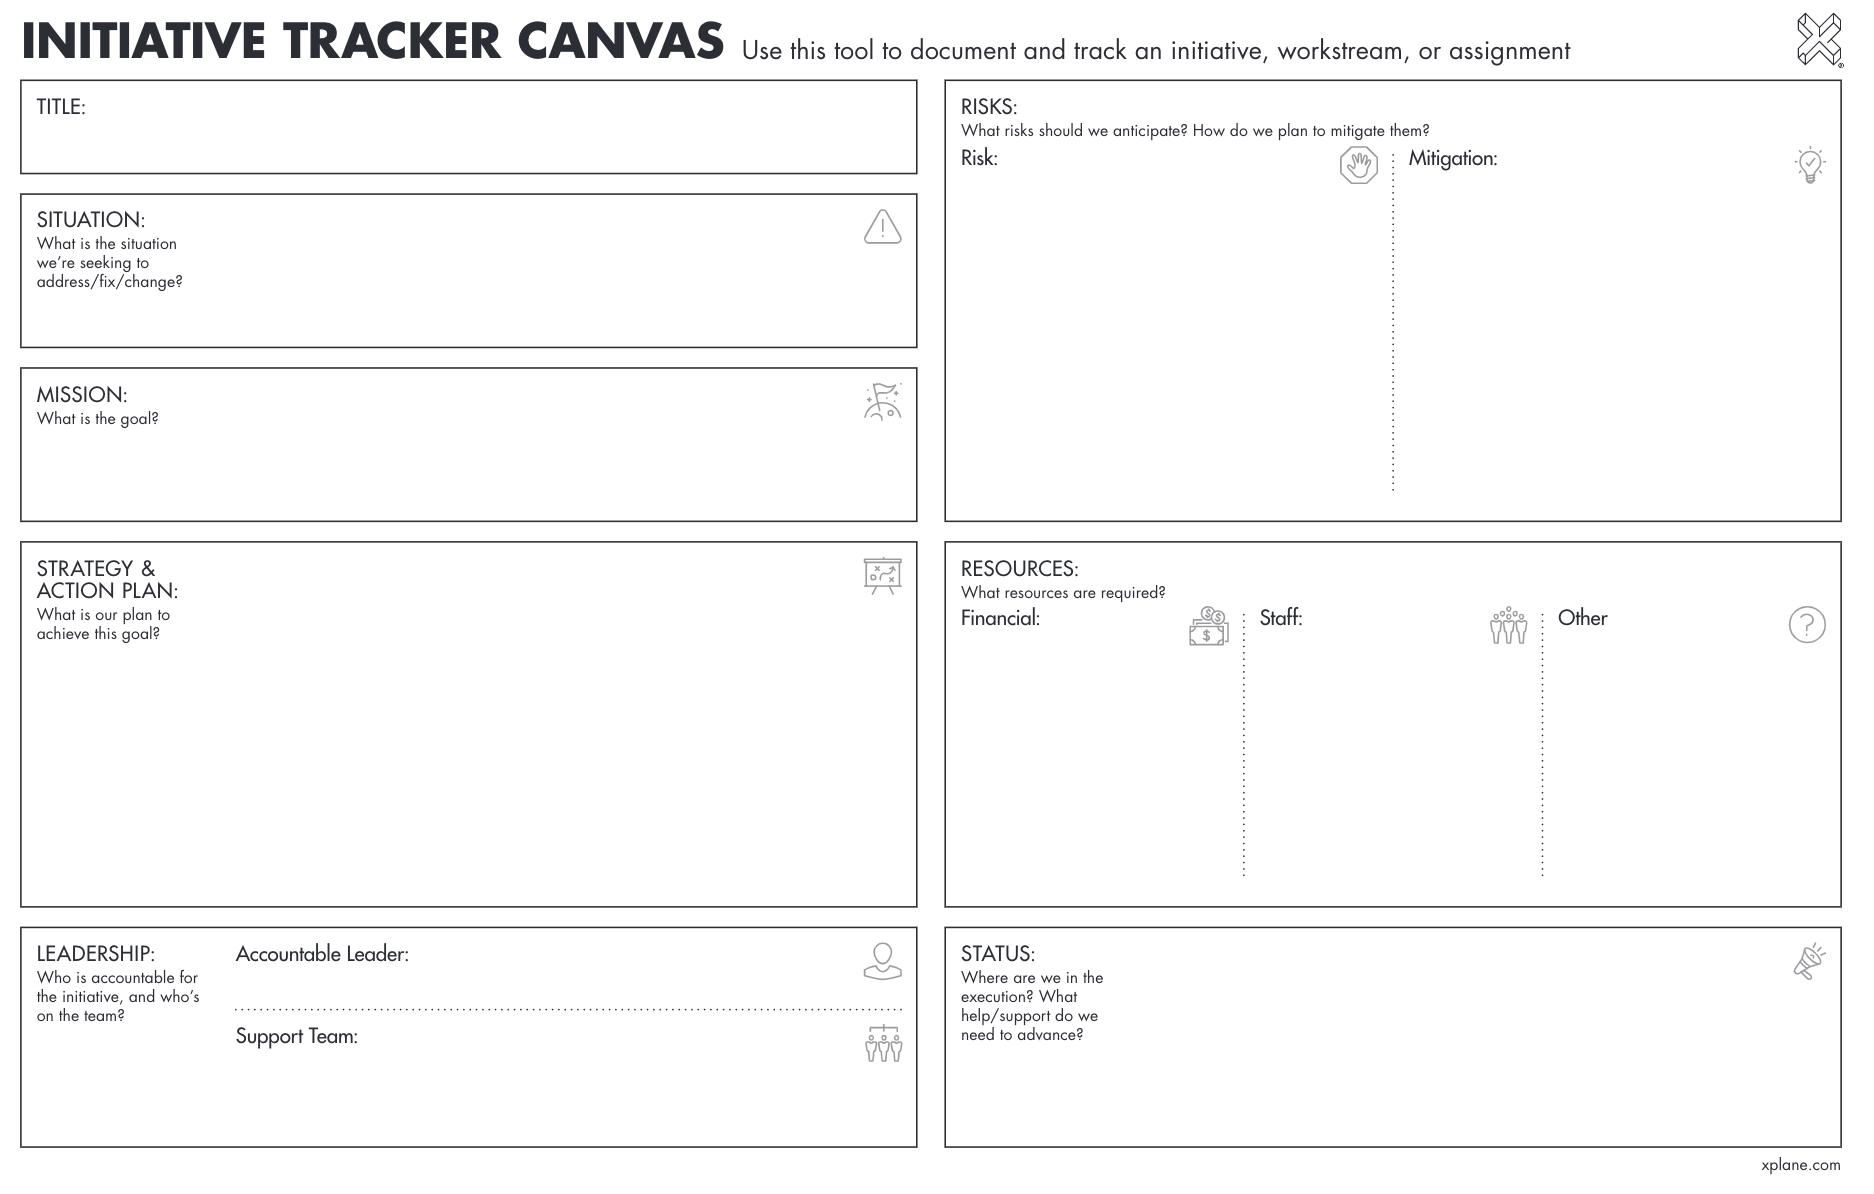 Initiative Tracker Canvas